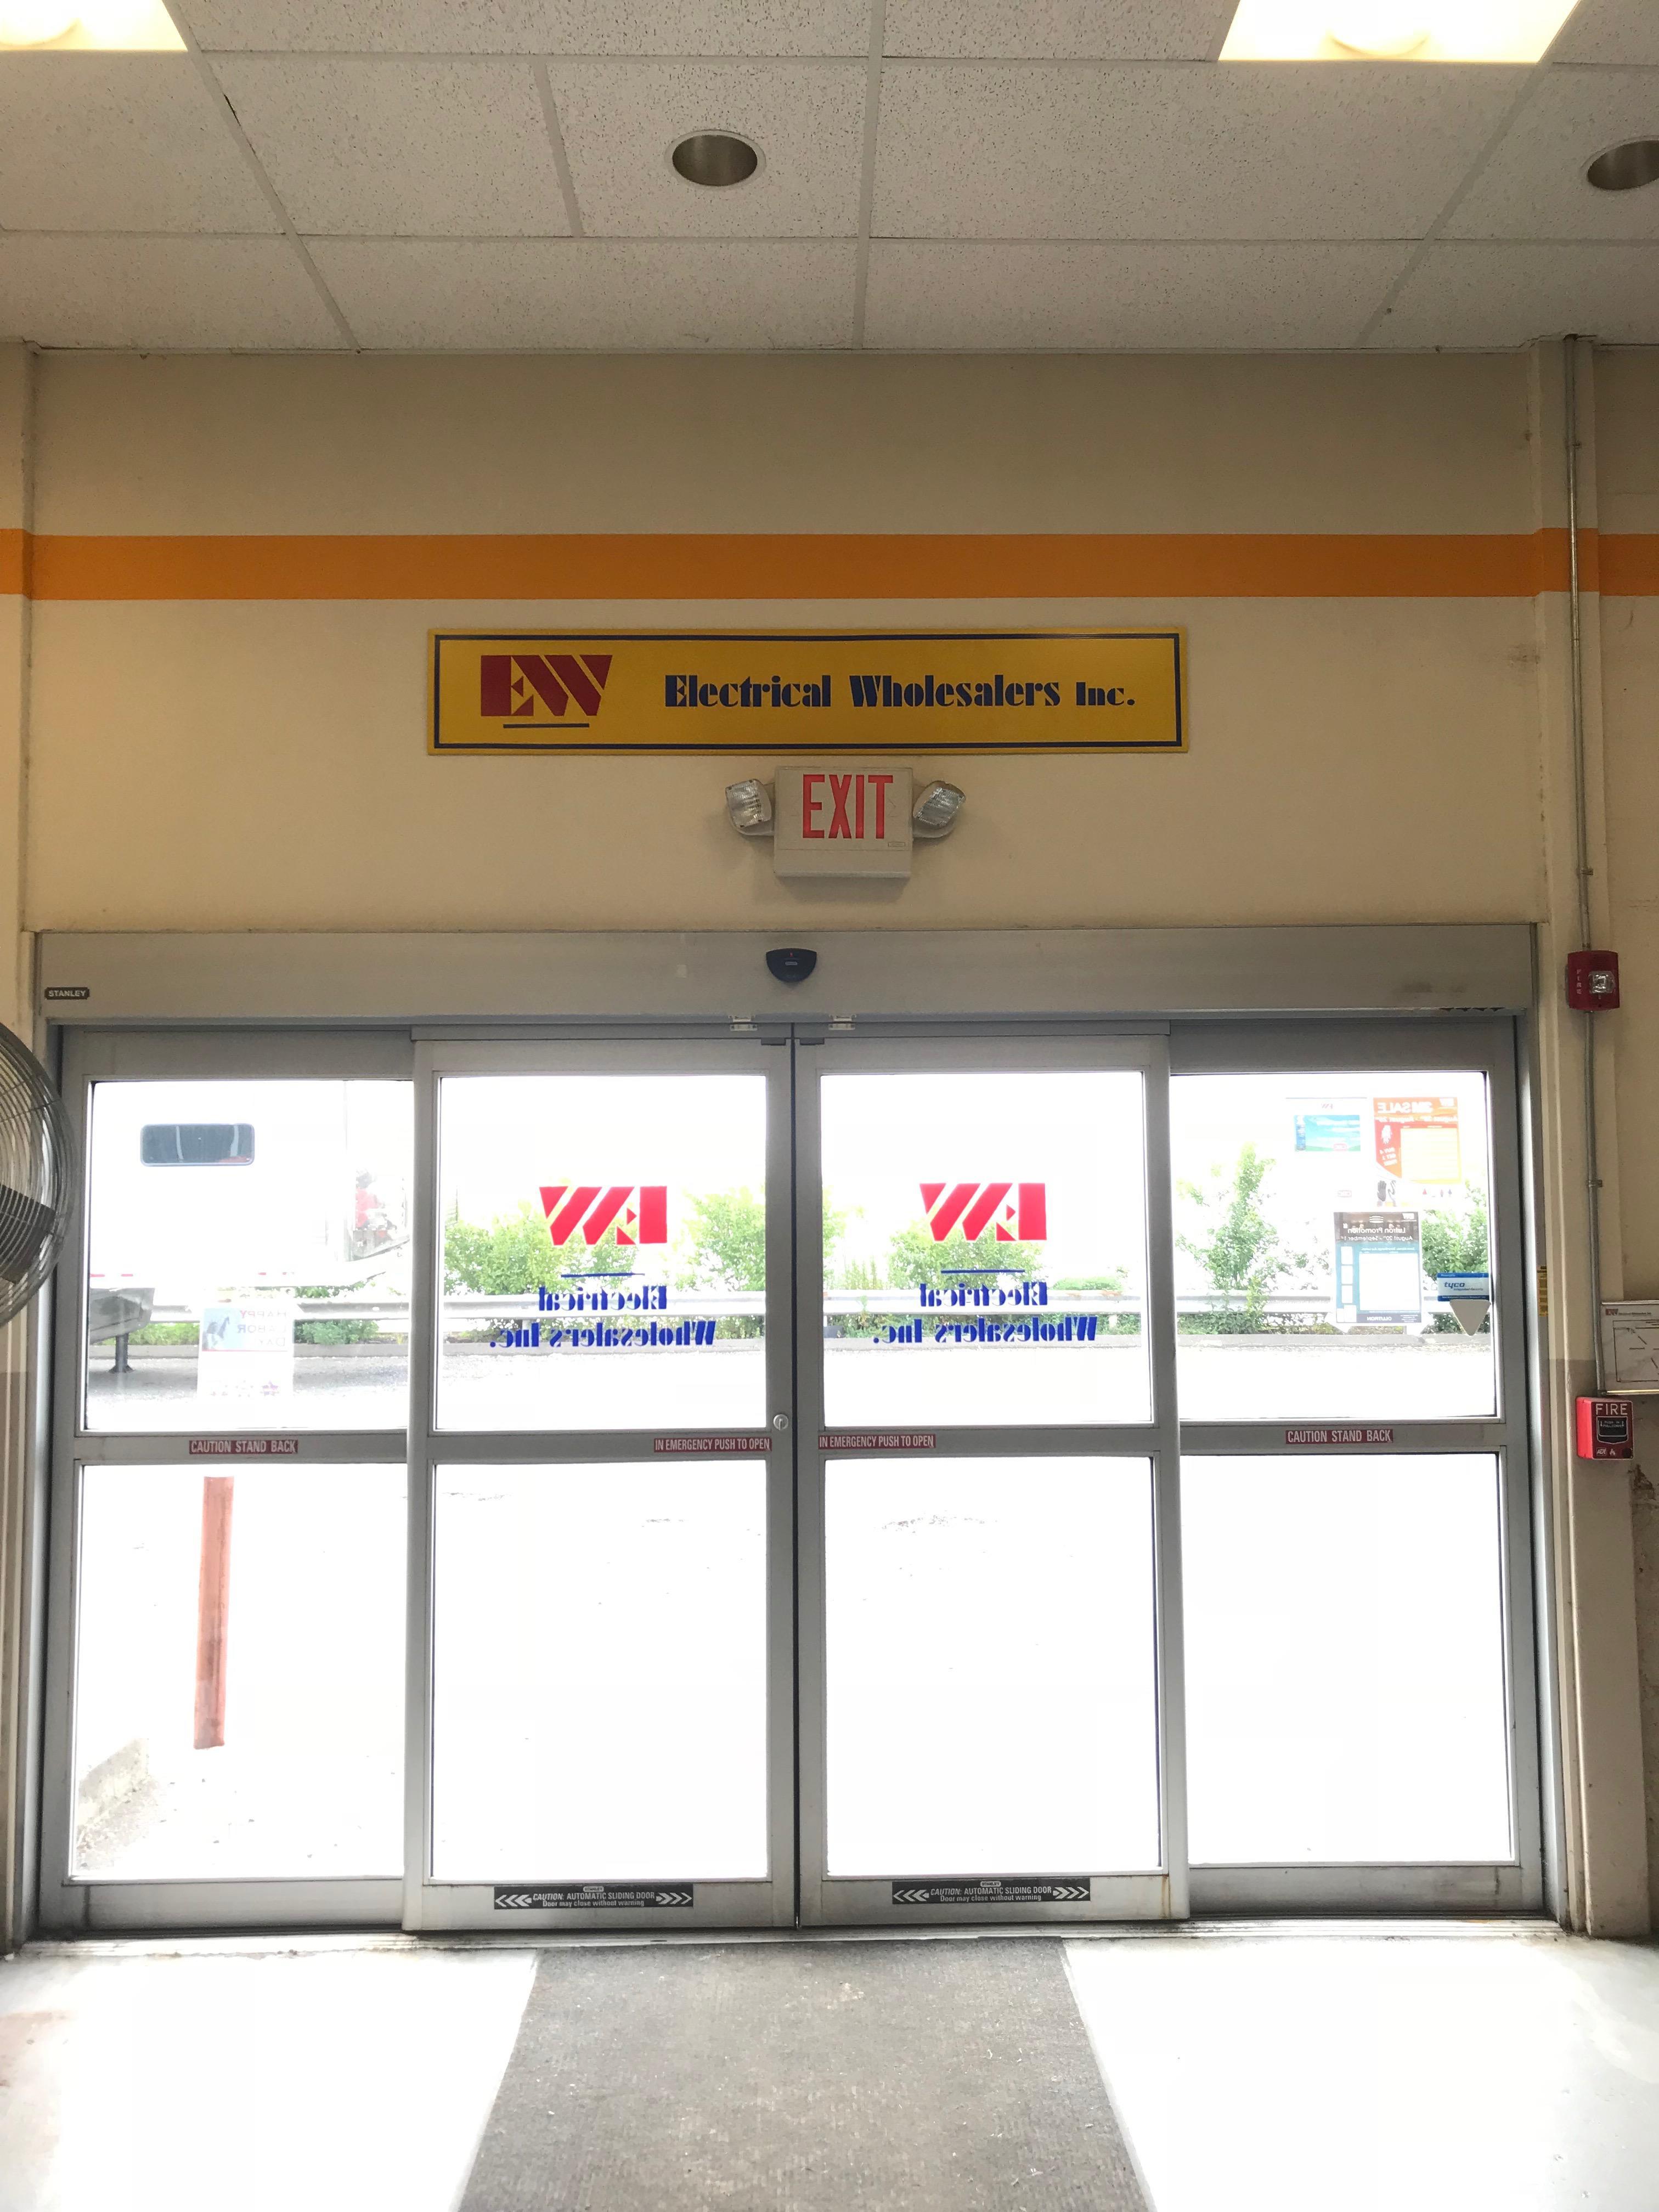 Electrical Wholesalers Inc. image 1